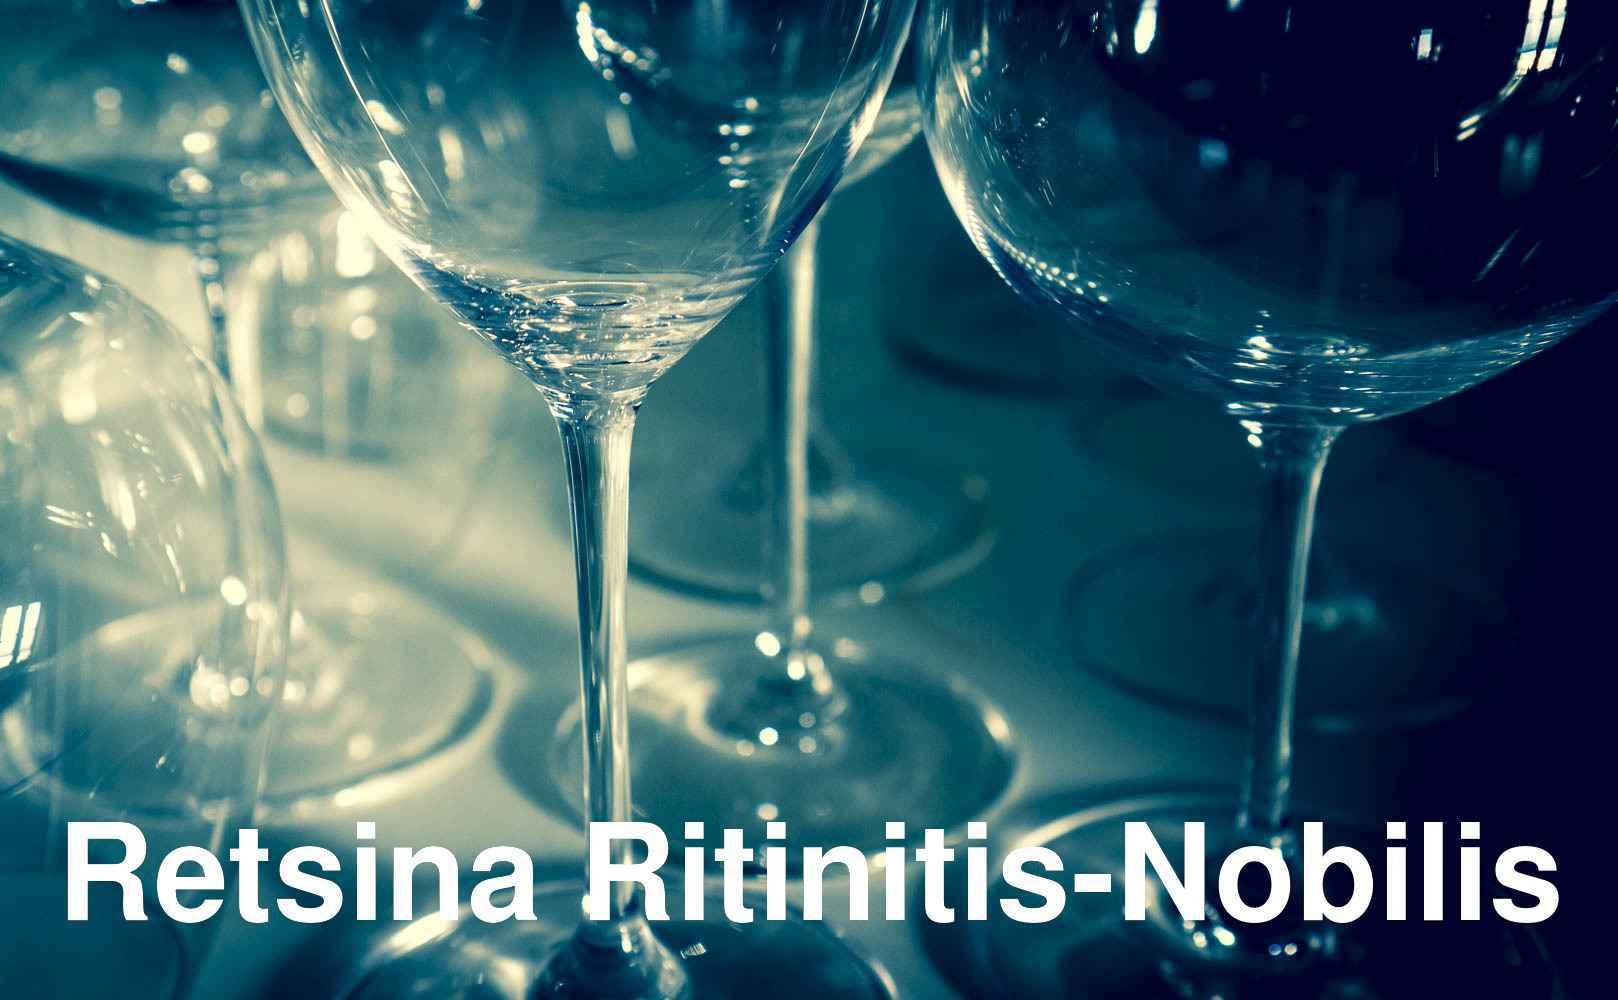 Retsina Ritinitis-Nobilis von Gaia Wines aus Nemea, Griechenland